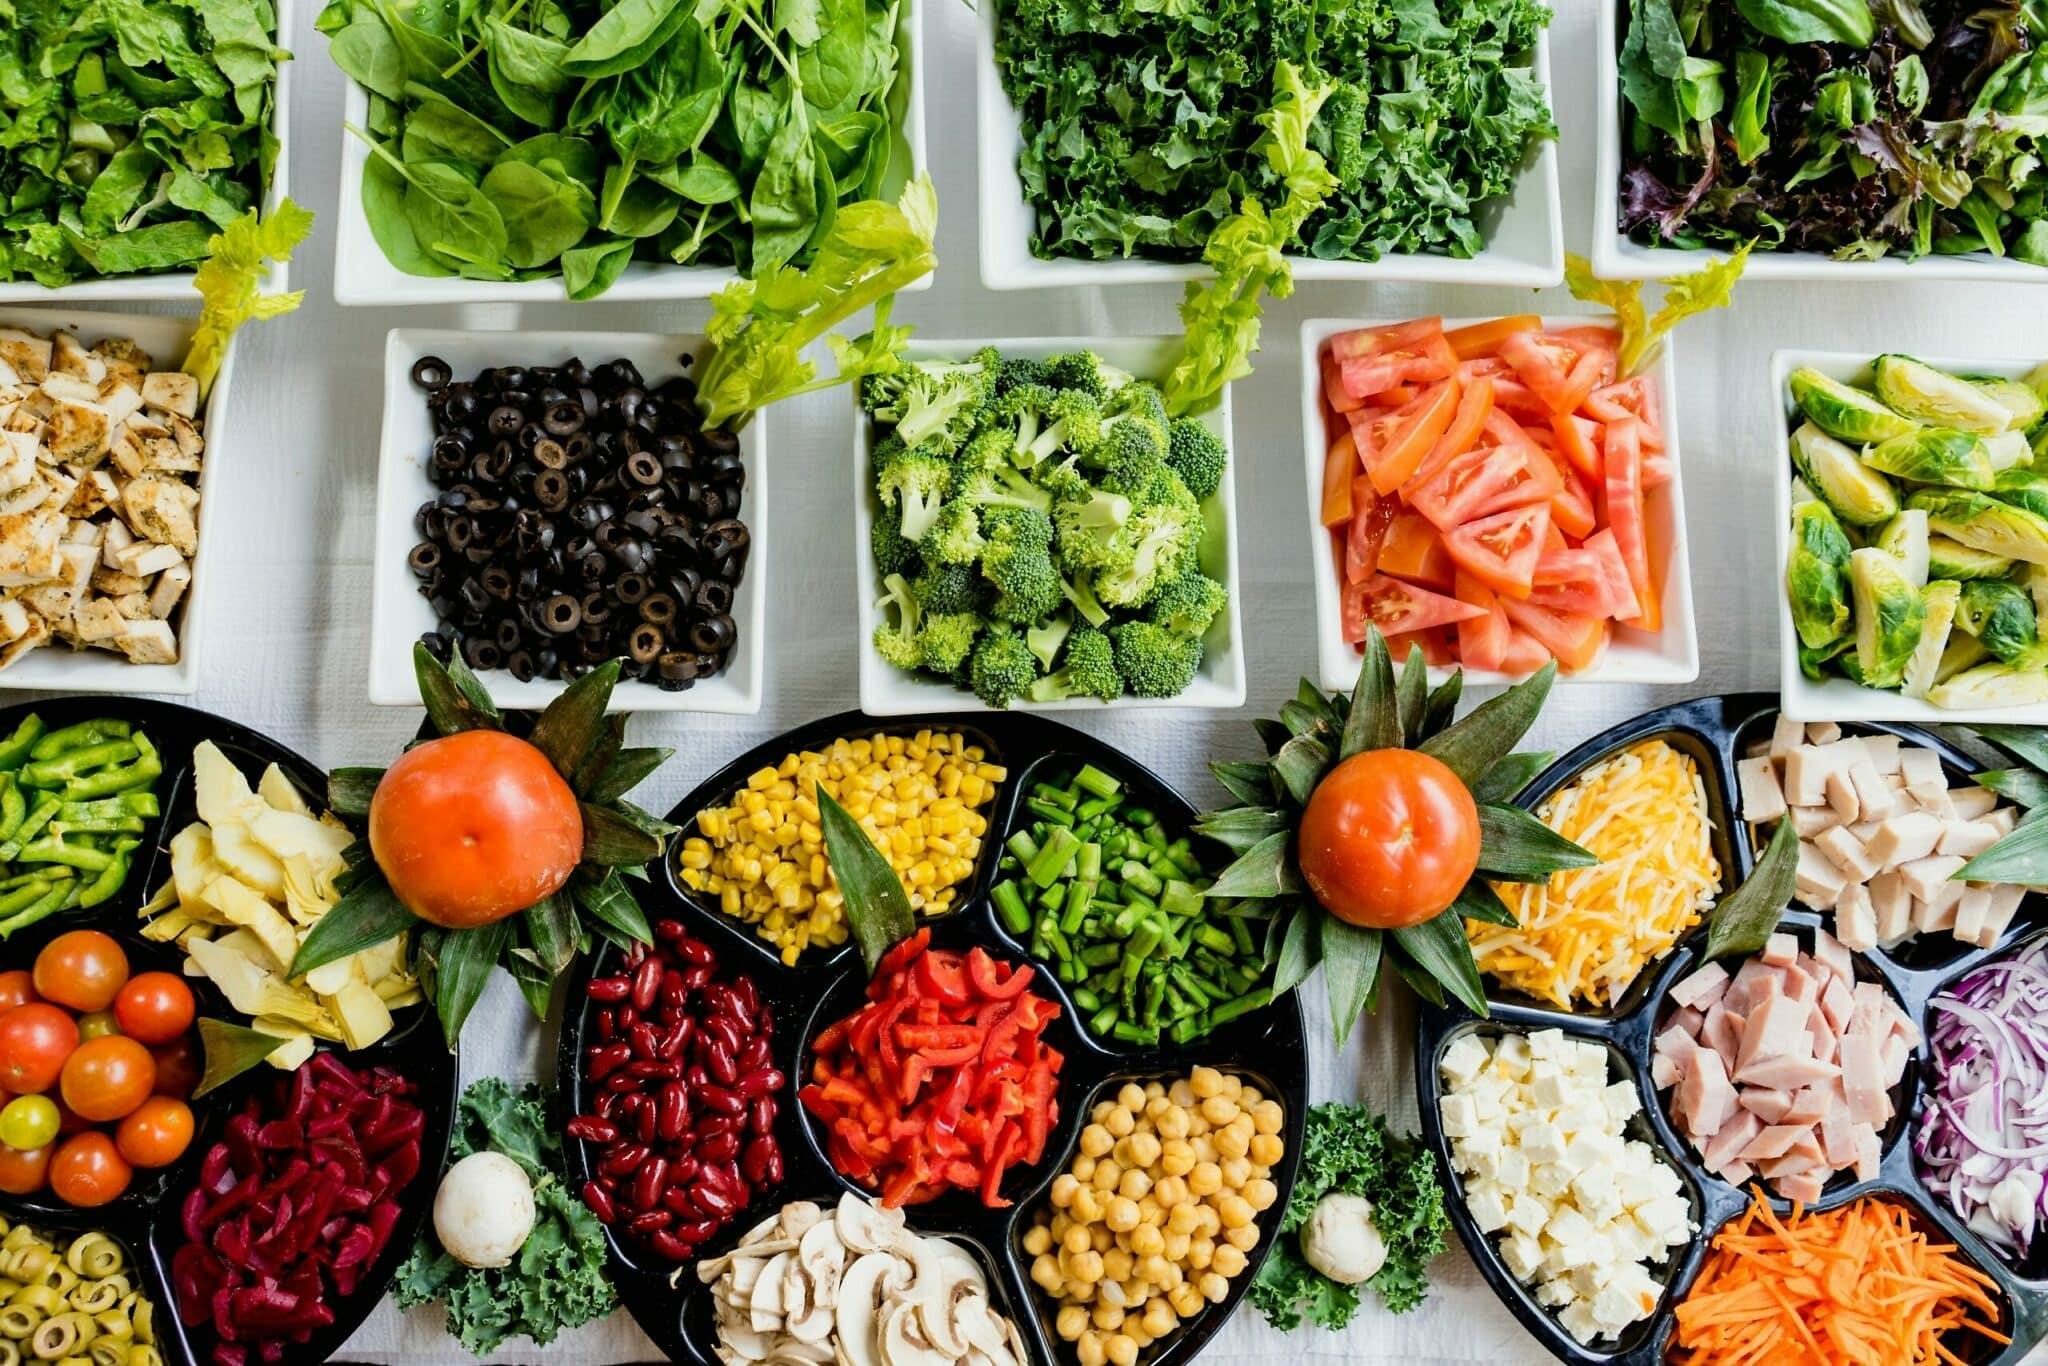 Healthy Foods Help Prevent Diabetes